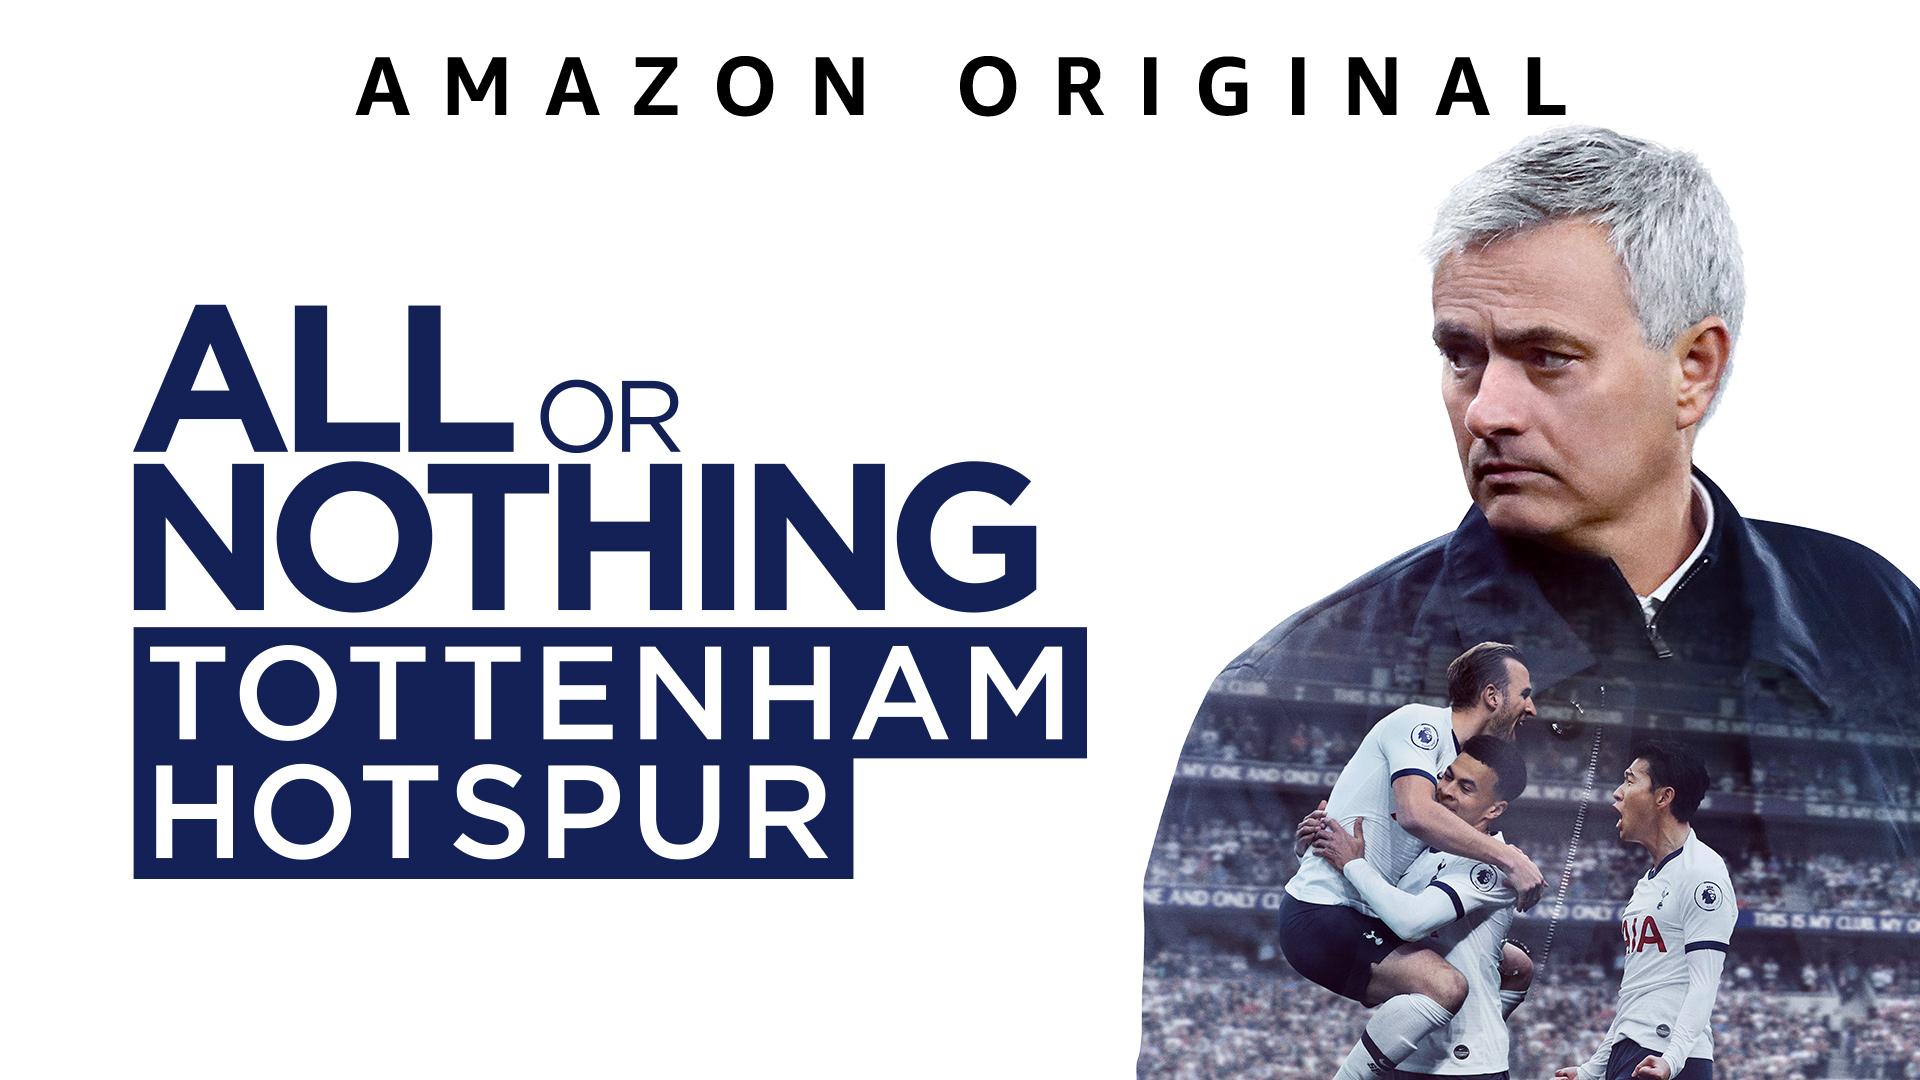 Wszystko albo nic: Tottenham Hotspur - Sezon 1